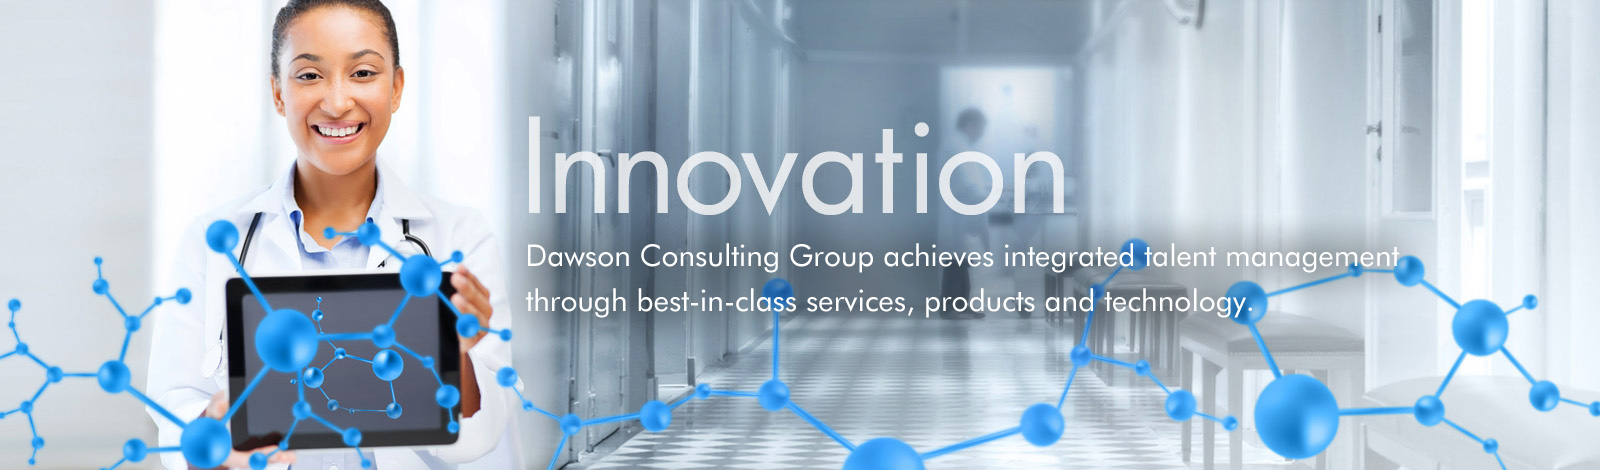 slideDAWSON_innovation_b